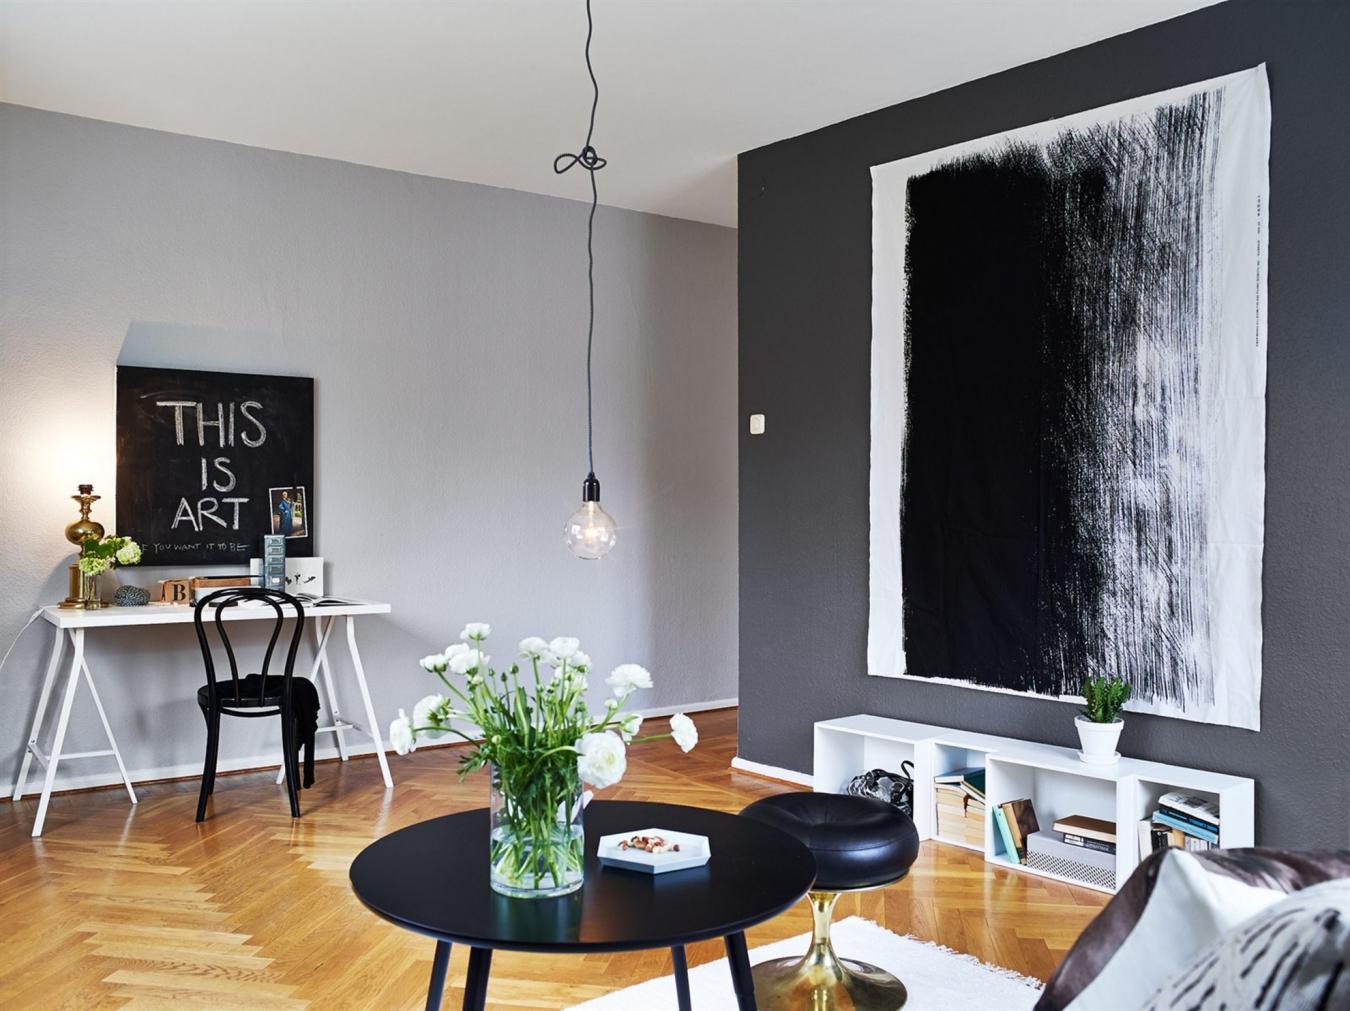 Ilumina tu casa con estilo decora con bombillas ideas - Decora tu casa barato ...